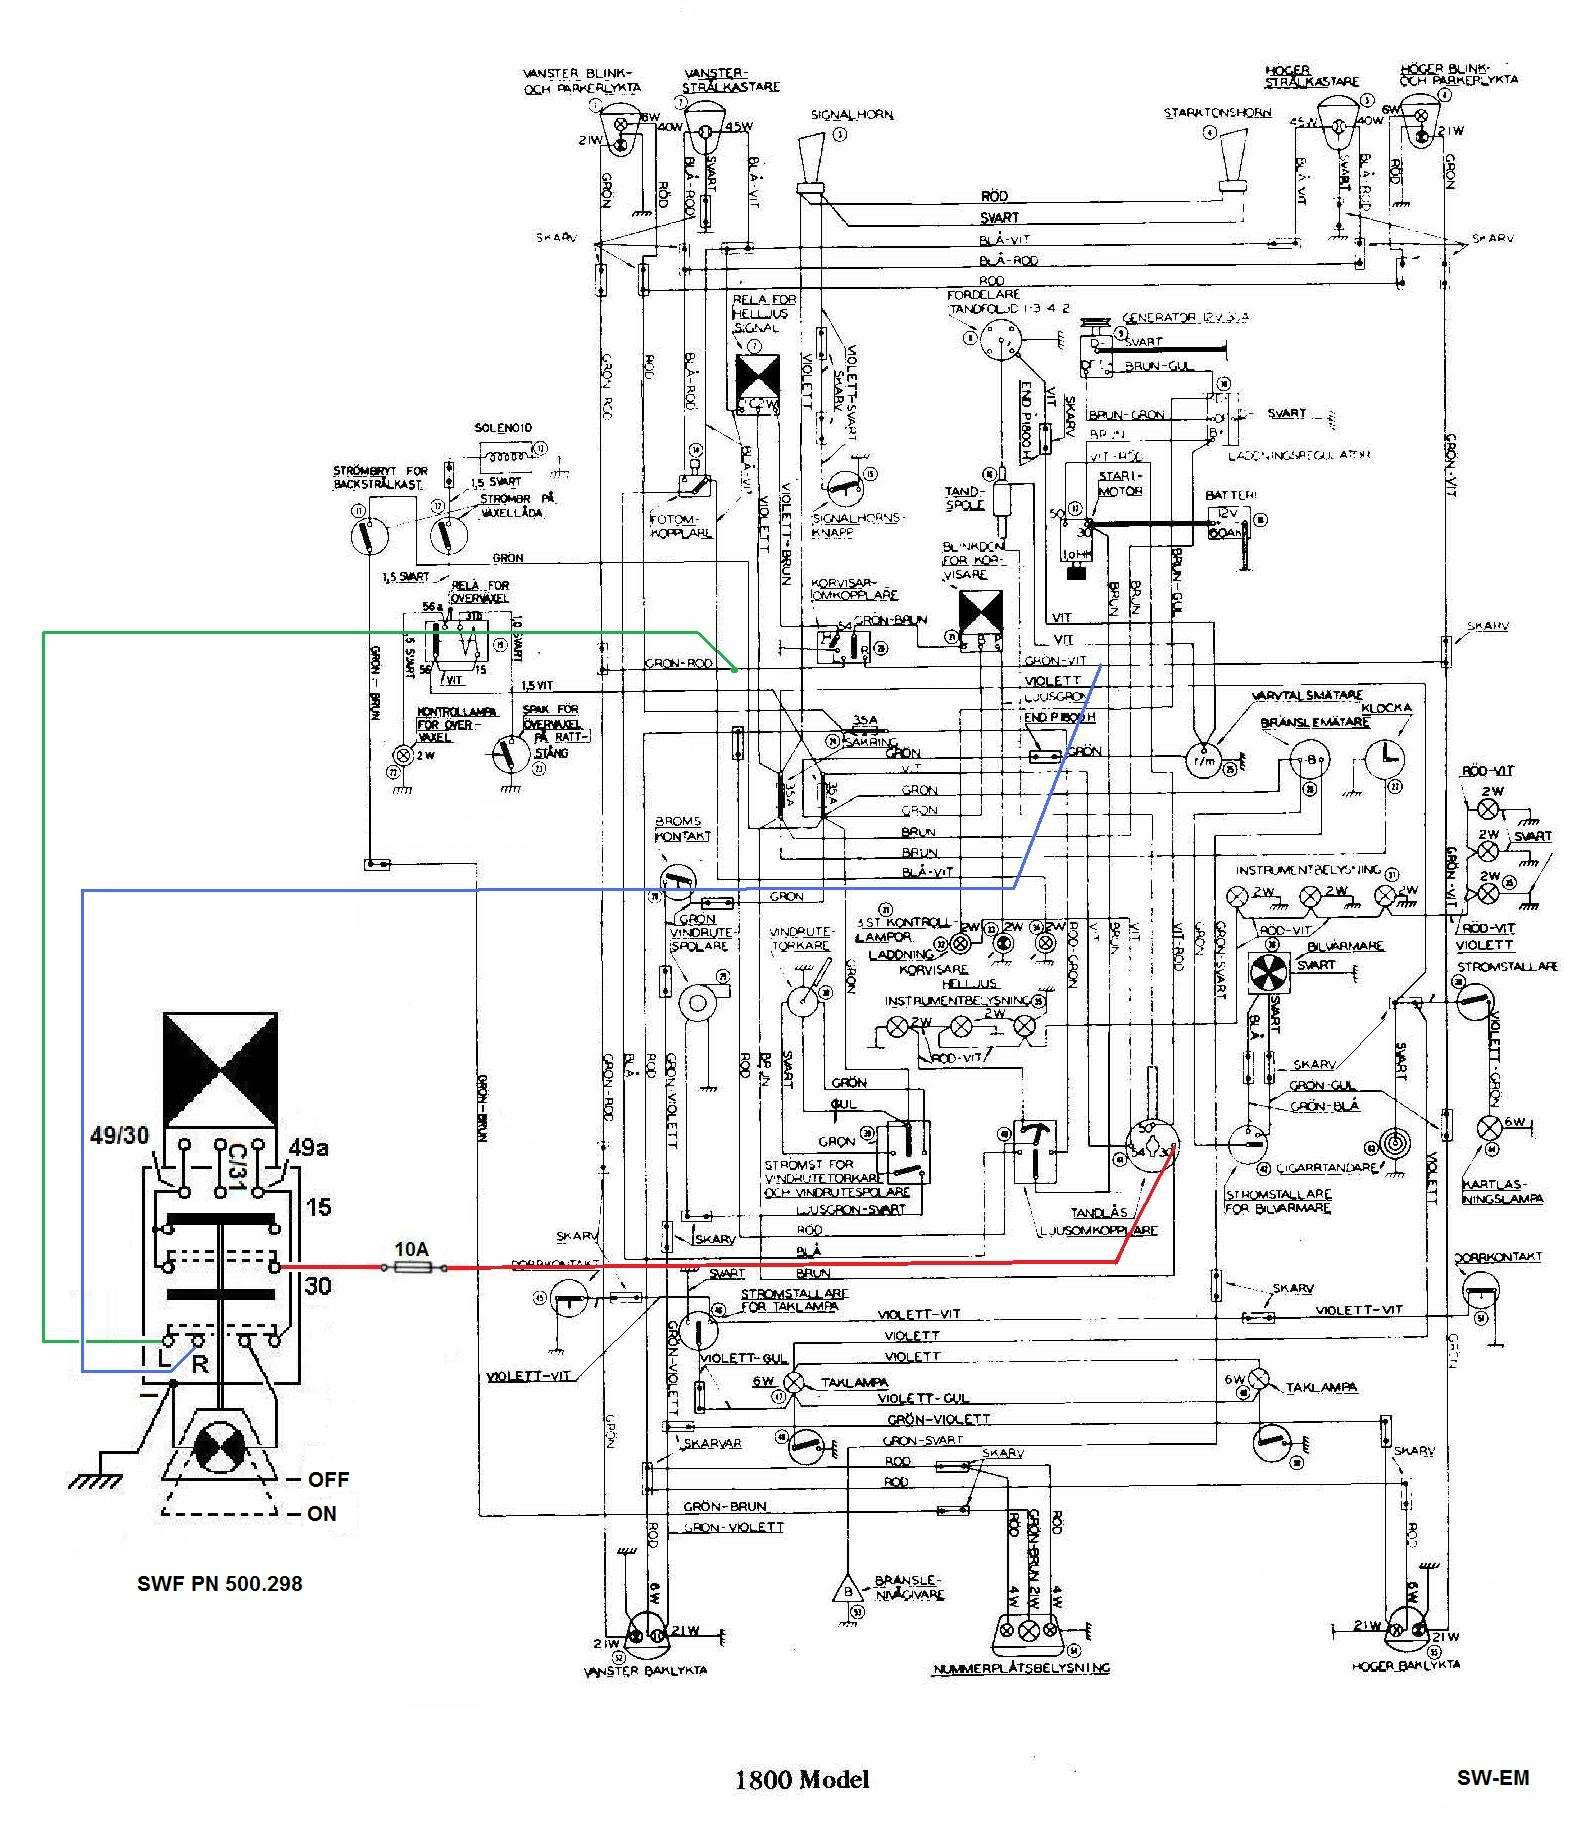 medium resolution of wiring diagram 3 way switch beautiful swf wiring diagram